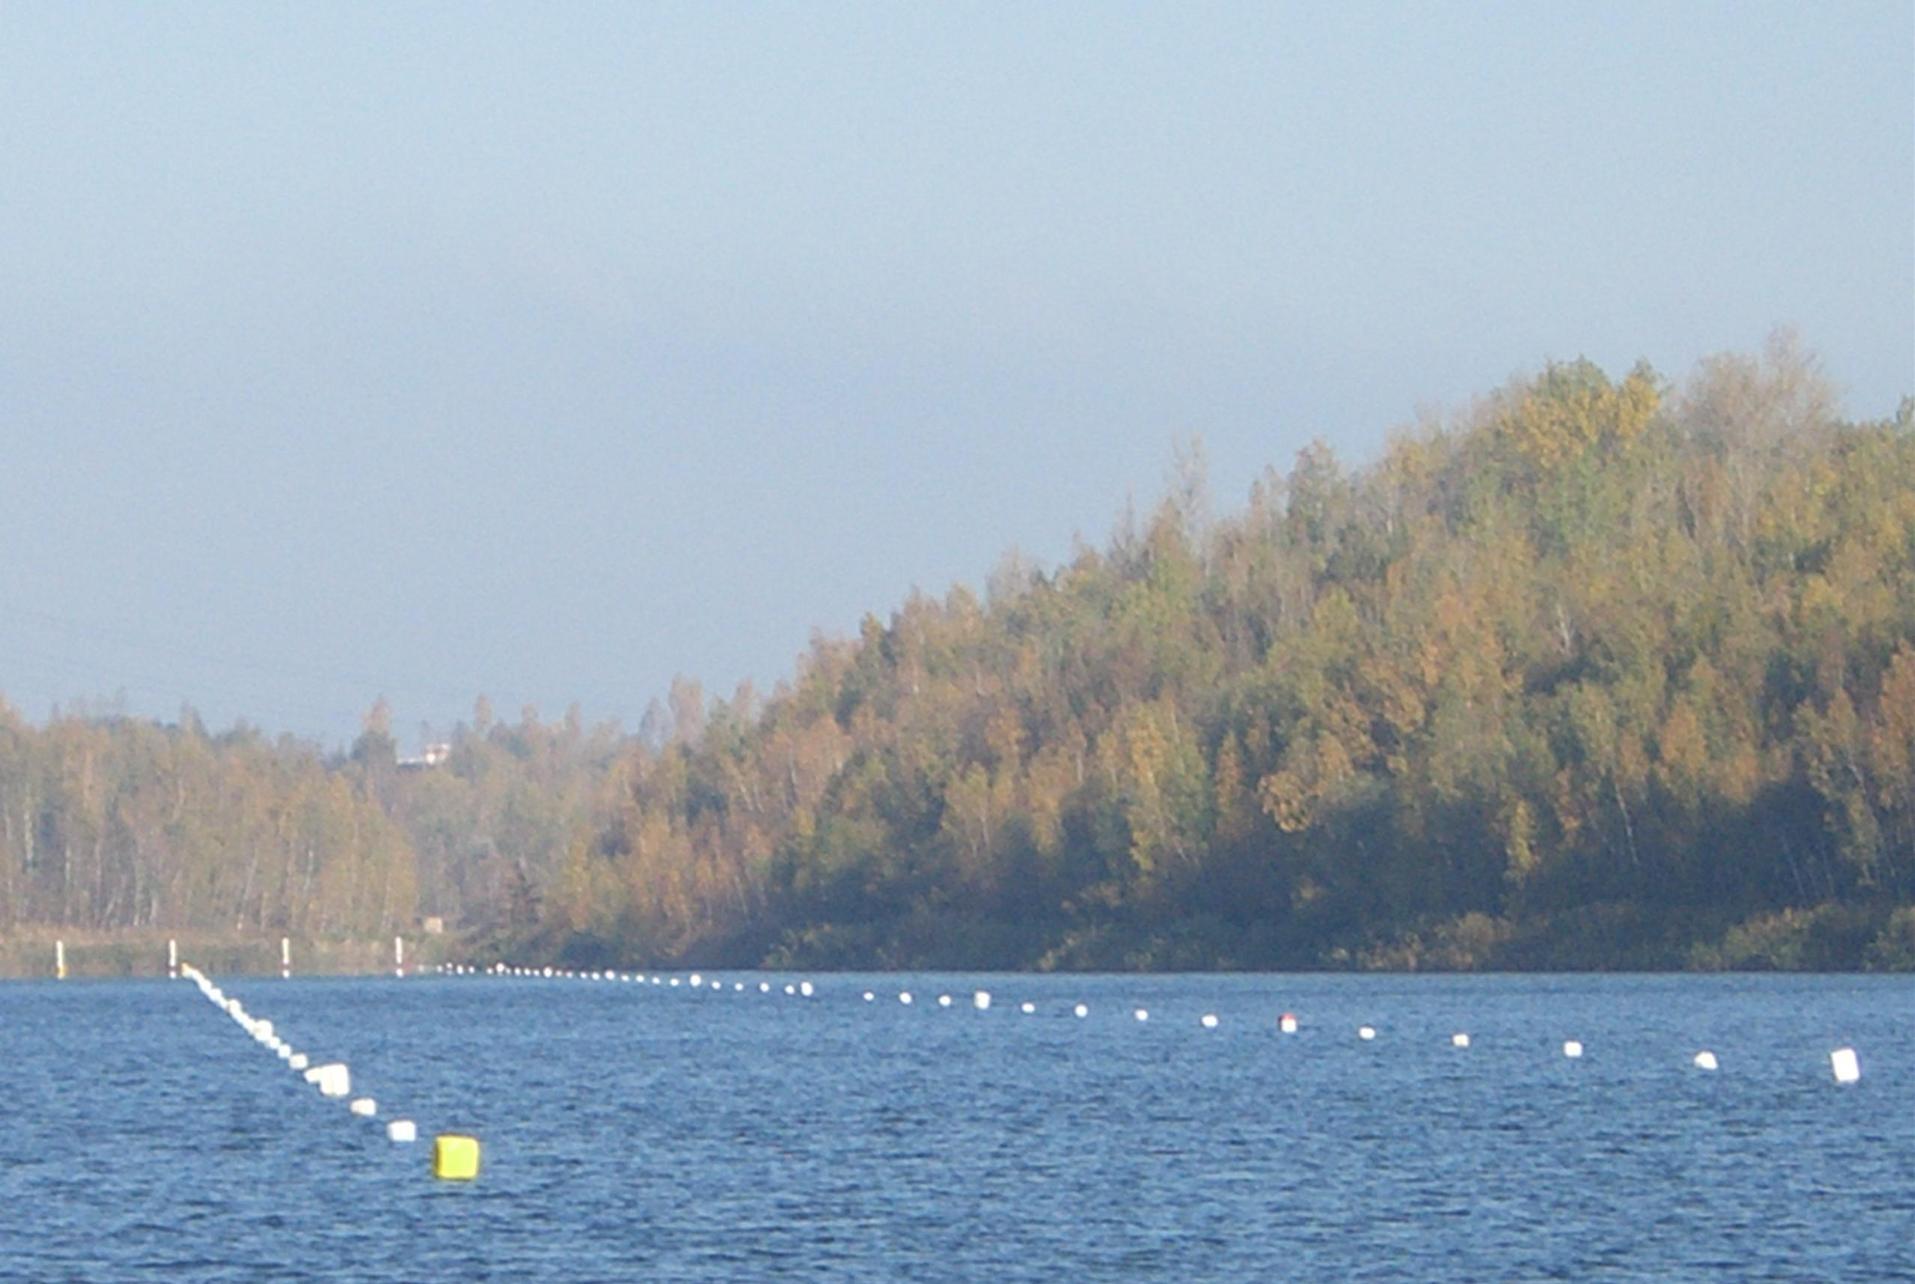 Regattastrecke Osendorfer See